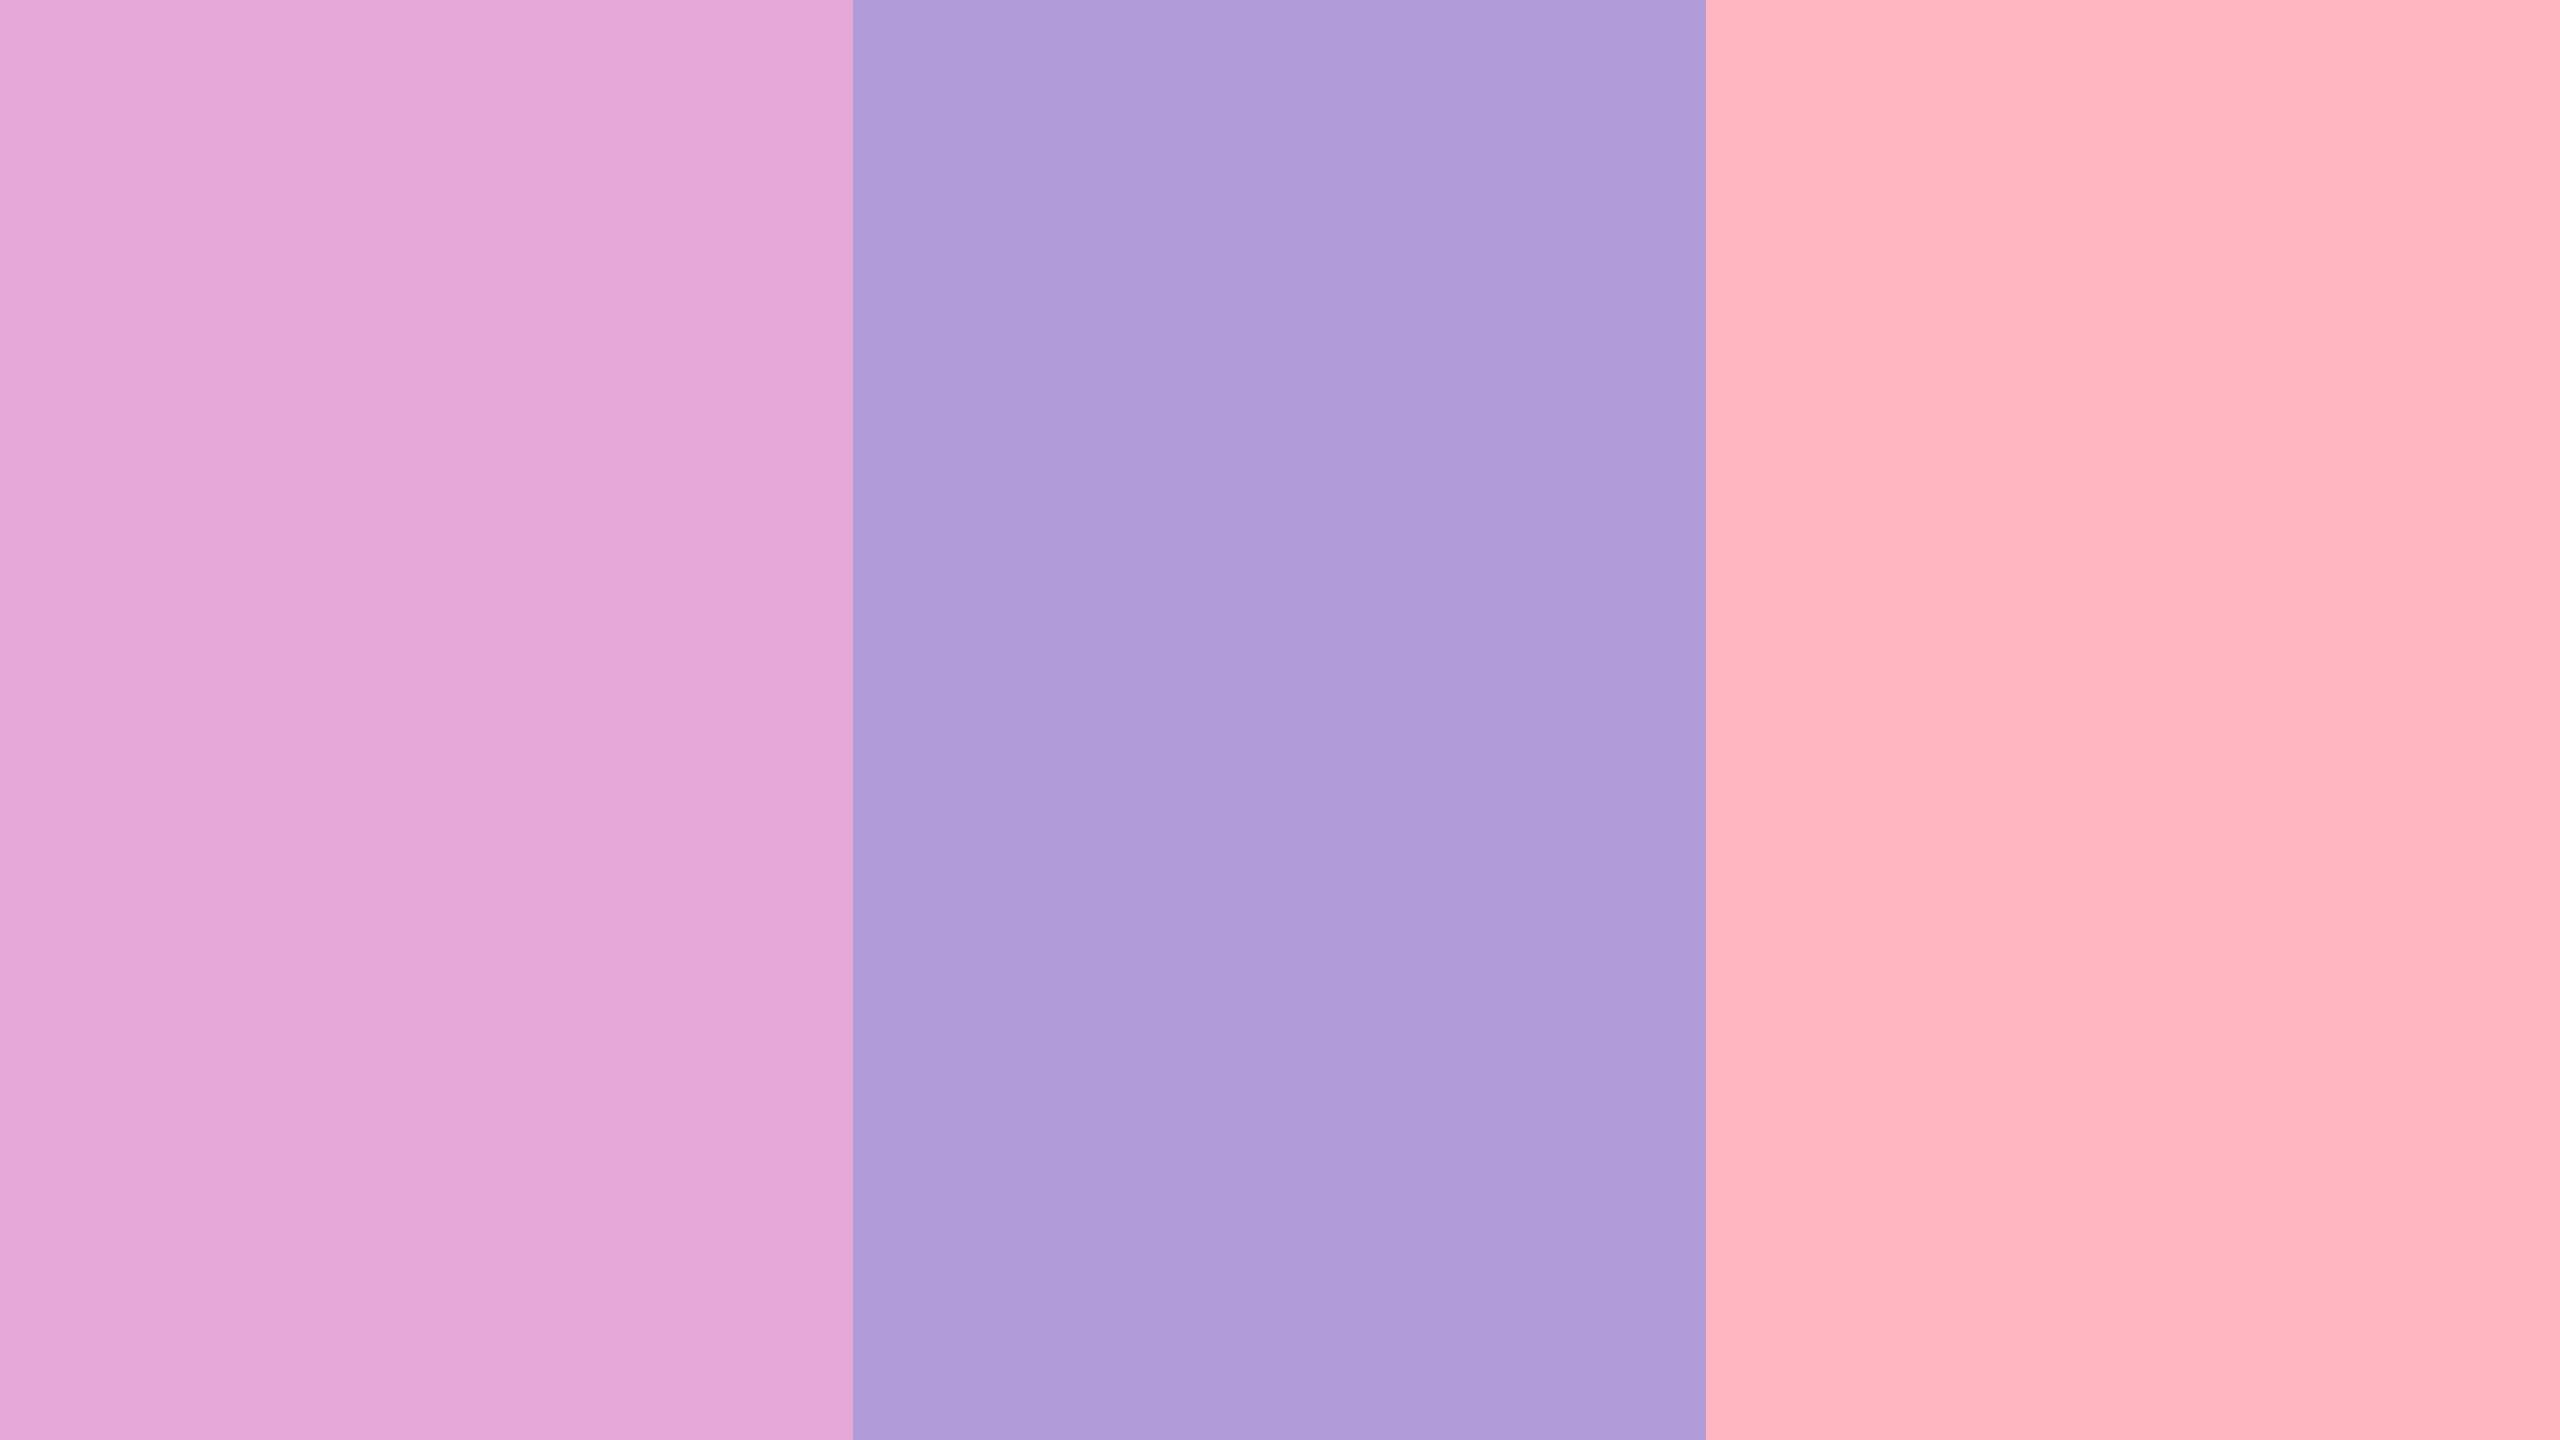 Purple And Pink Windows 7 Wallpaper Wallpapers Hd Desktop Picture 2560x1440